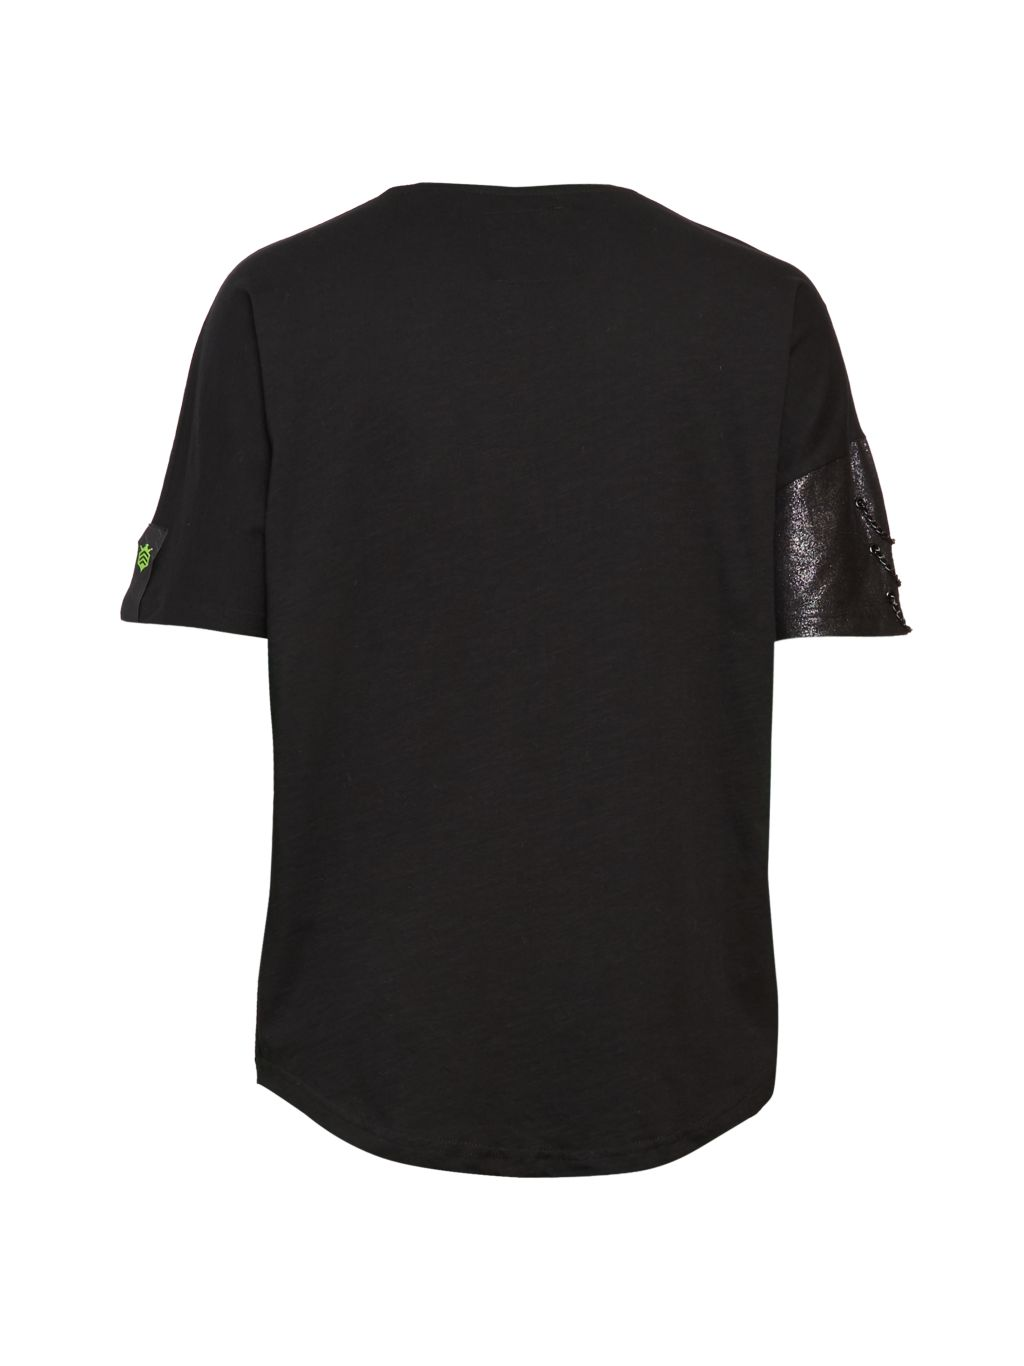 RON TOMSON Chain-Trimmed Glitter Cotton T-Shirt